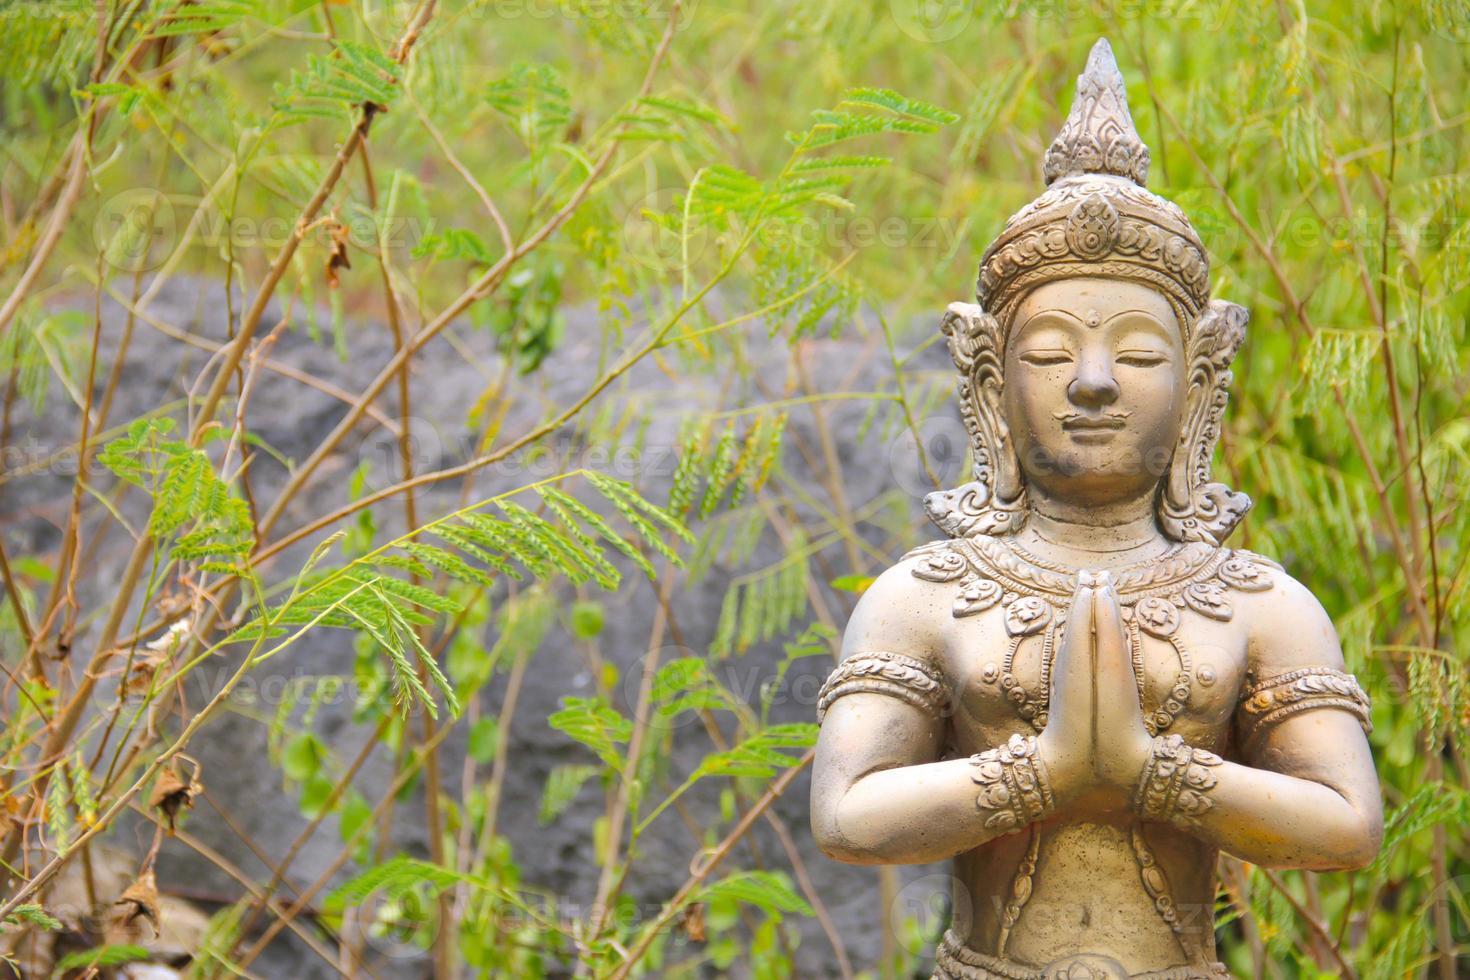 escultura asiática tailandesa foto